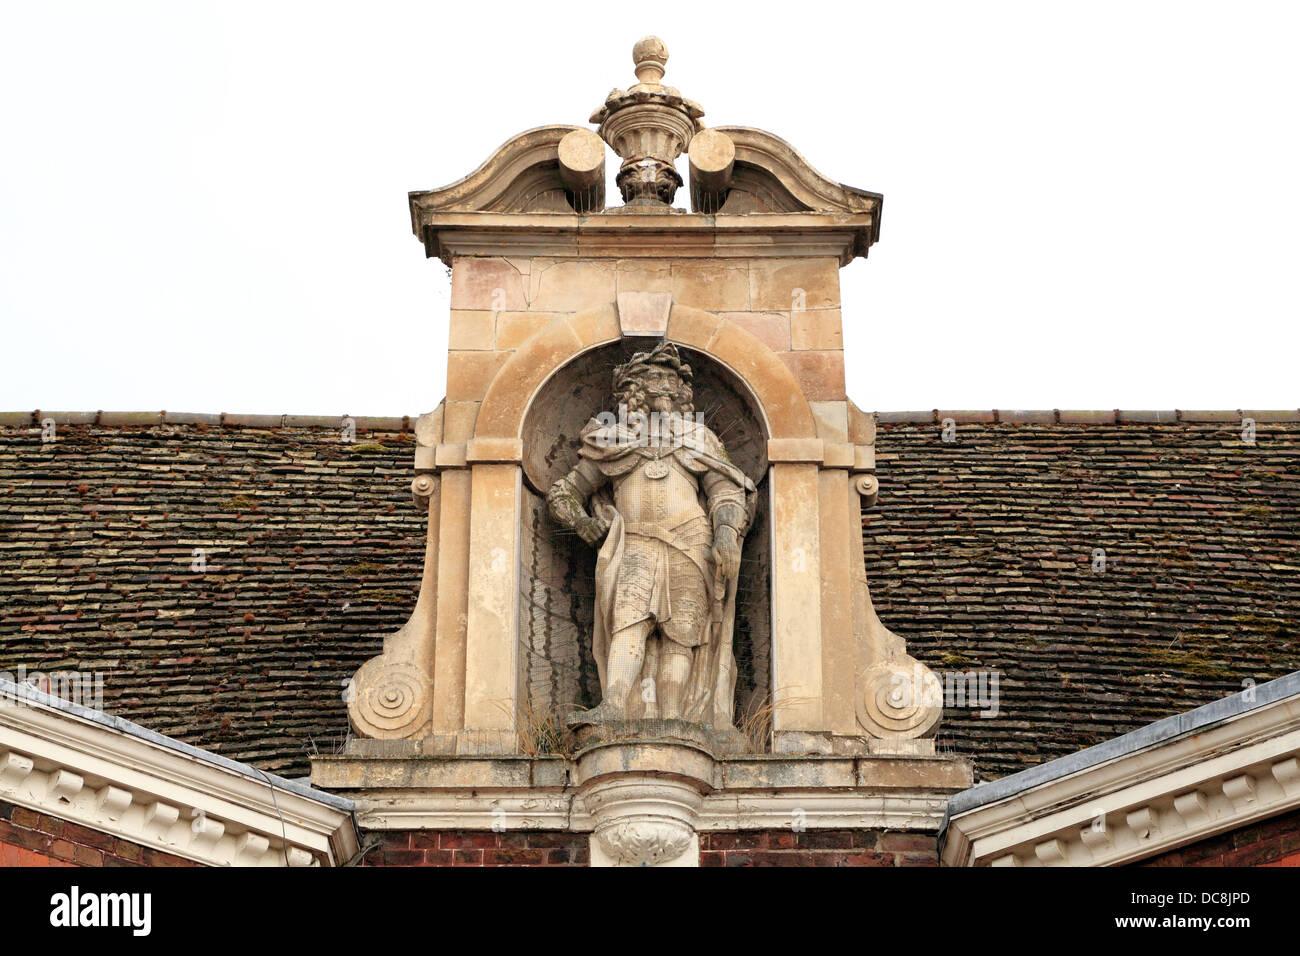 Kings Staithe, Kings Lynn, King Charles 1st statue, 17th century, Norfolk, England, UK, English kings monarchs statues - Stock Image